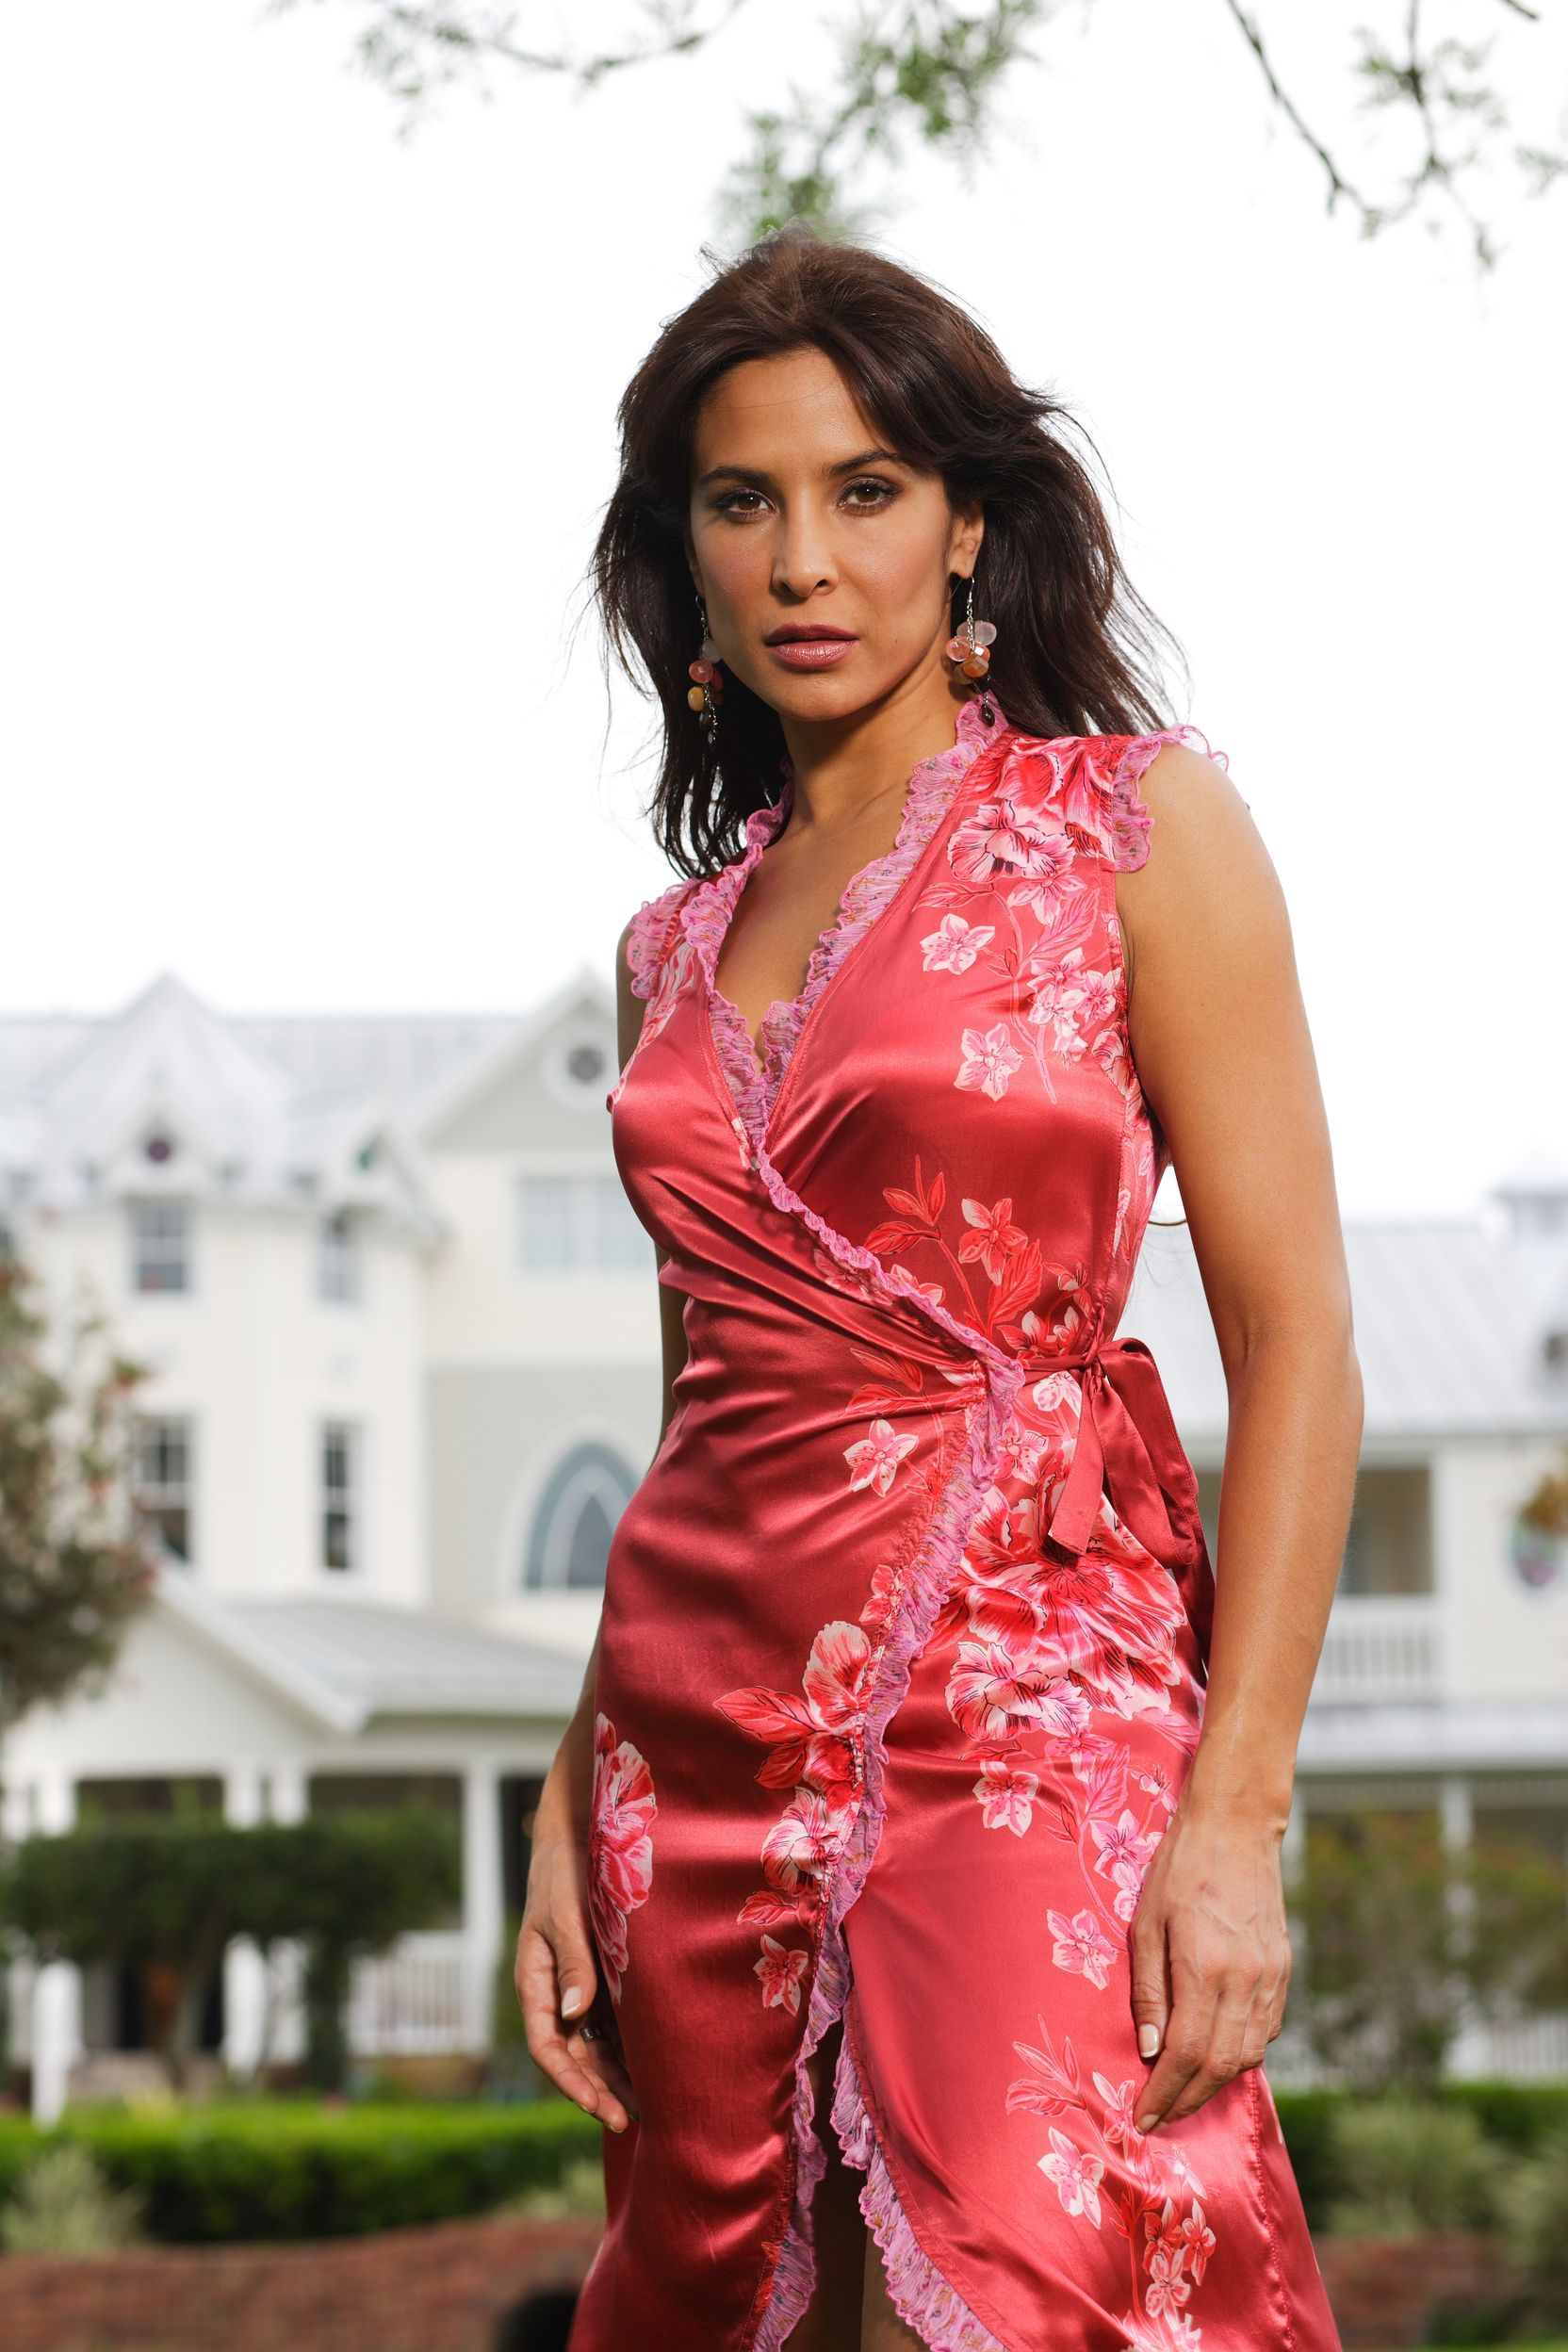 Lorena Rojas Lorena Rojas new pictures